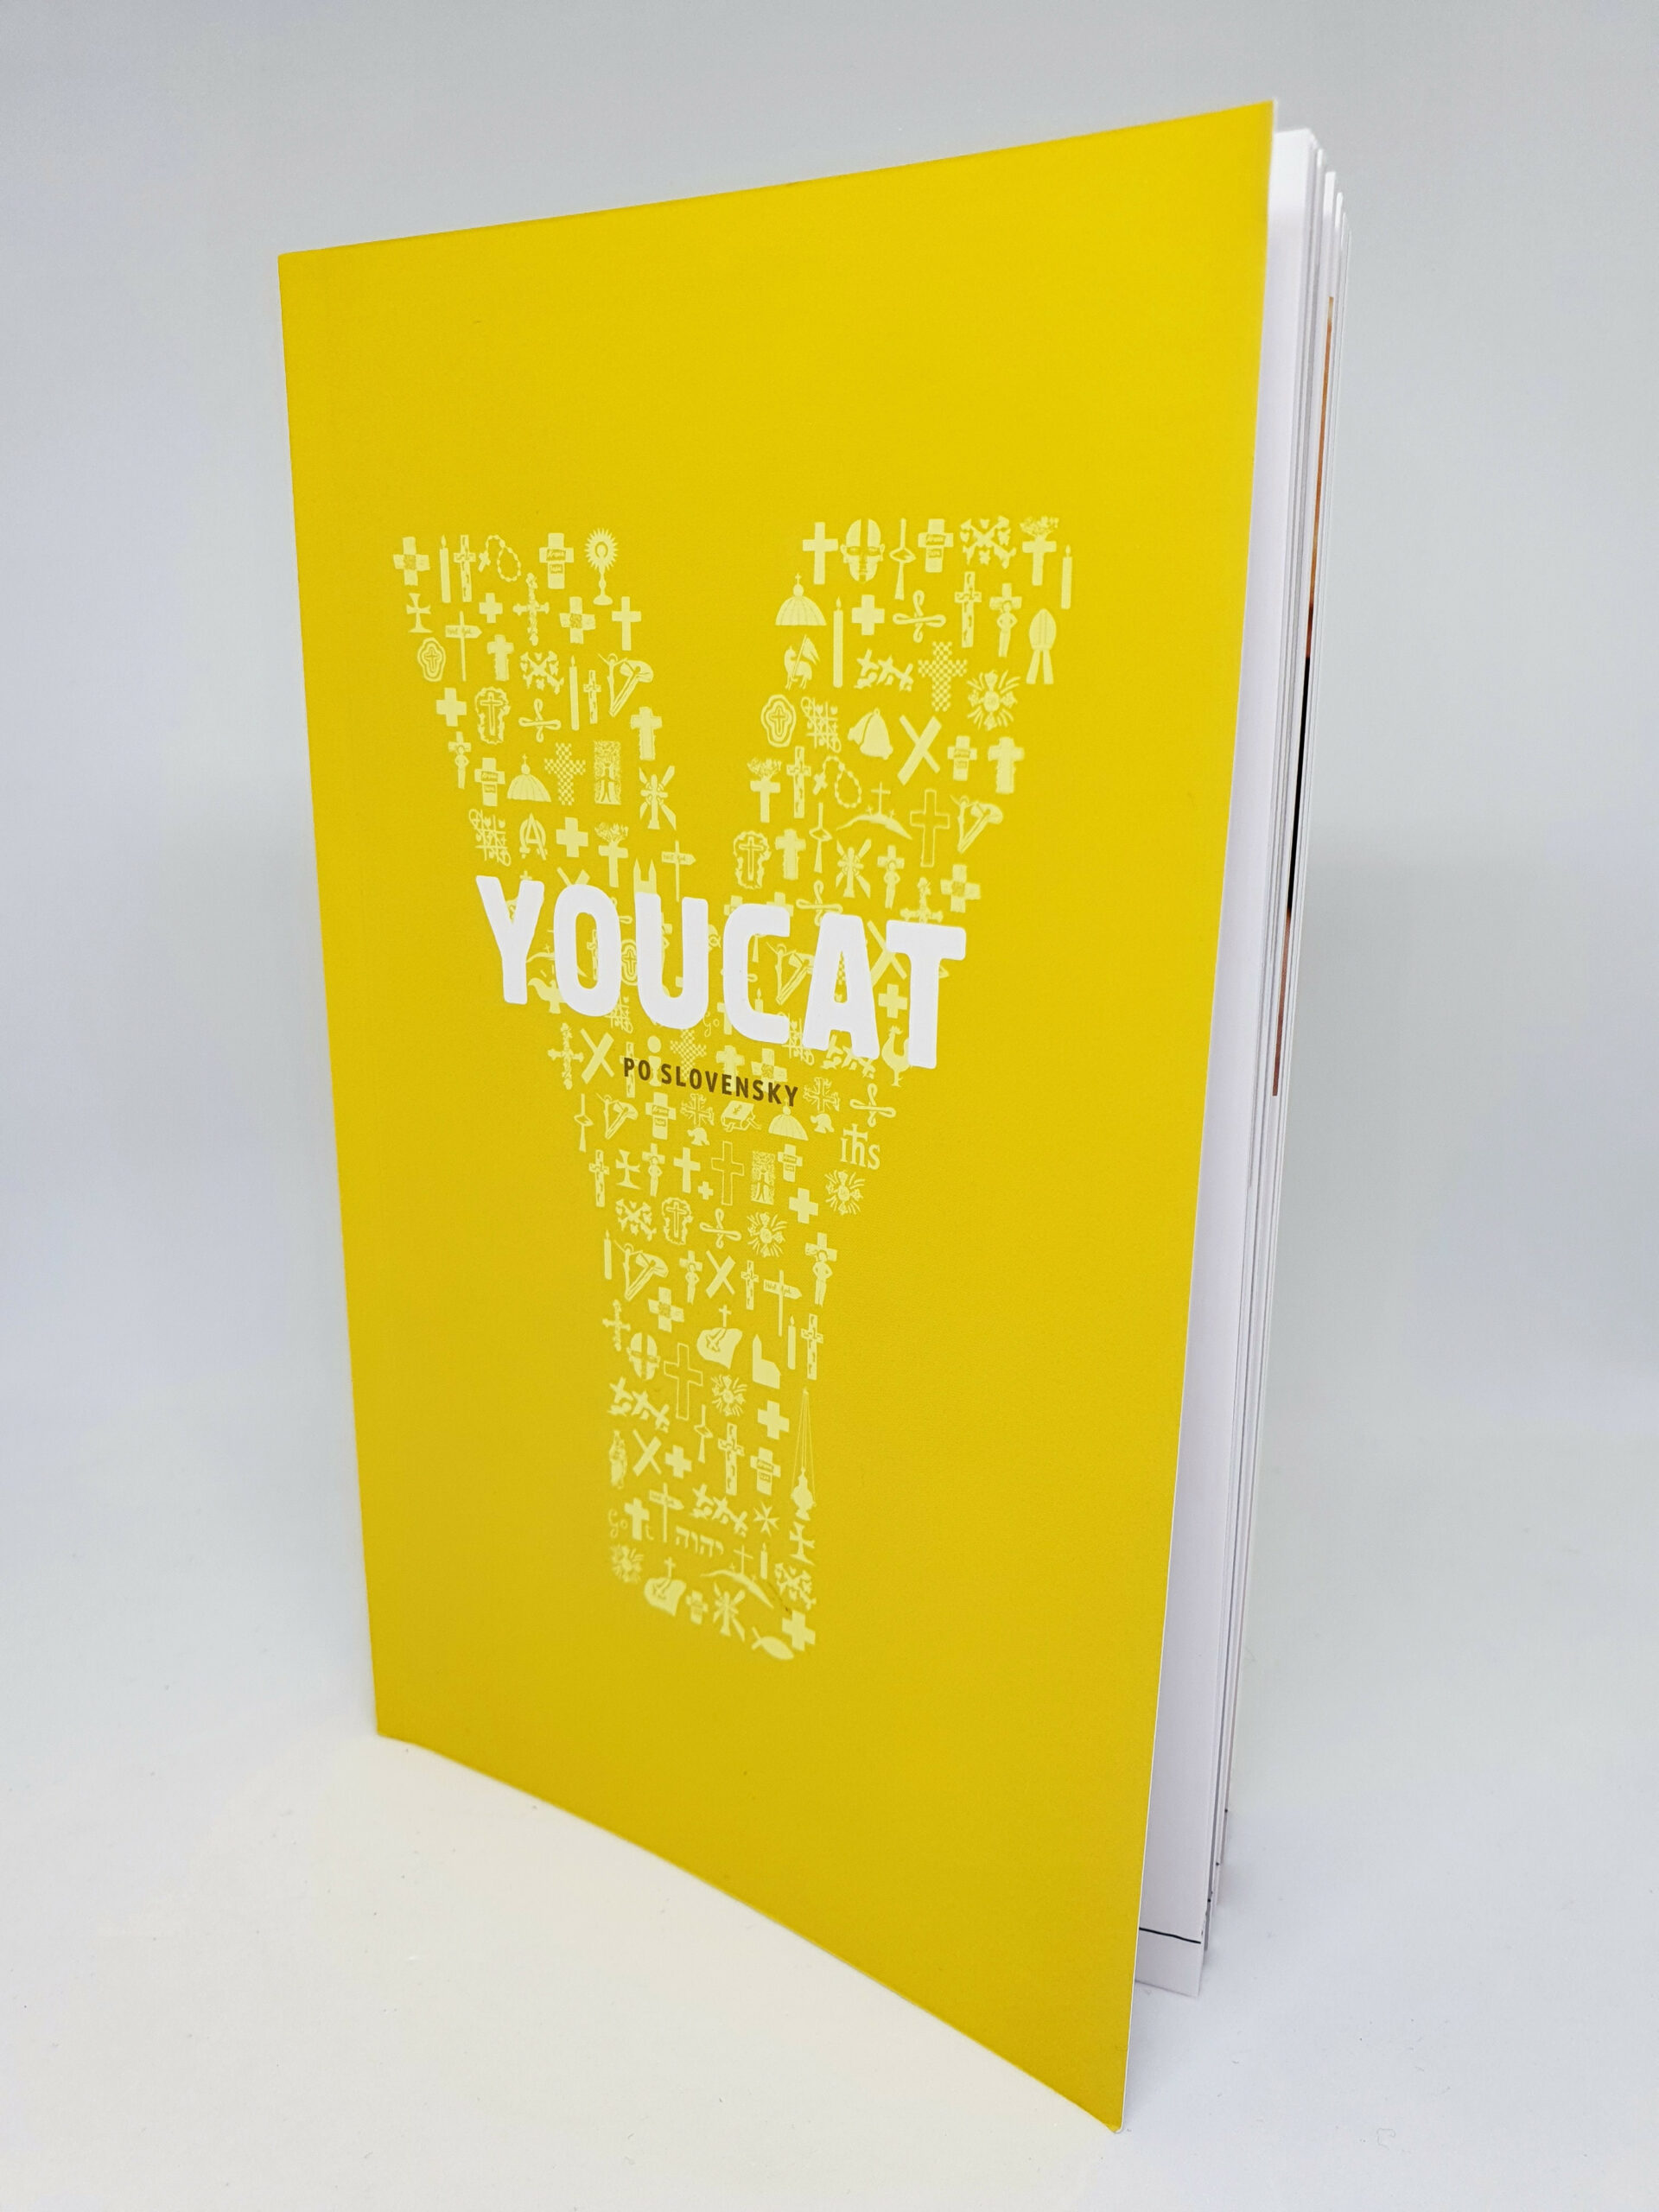 youcat - žltý